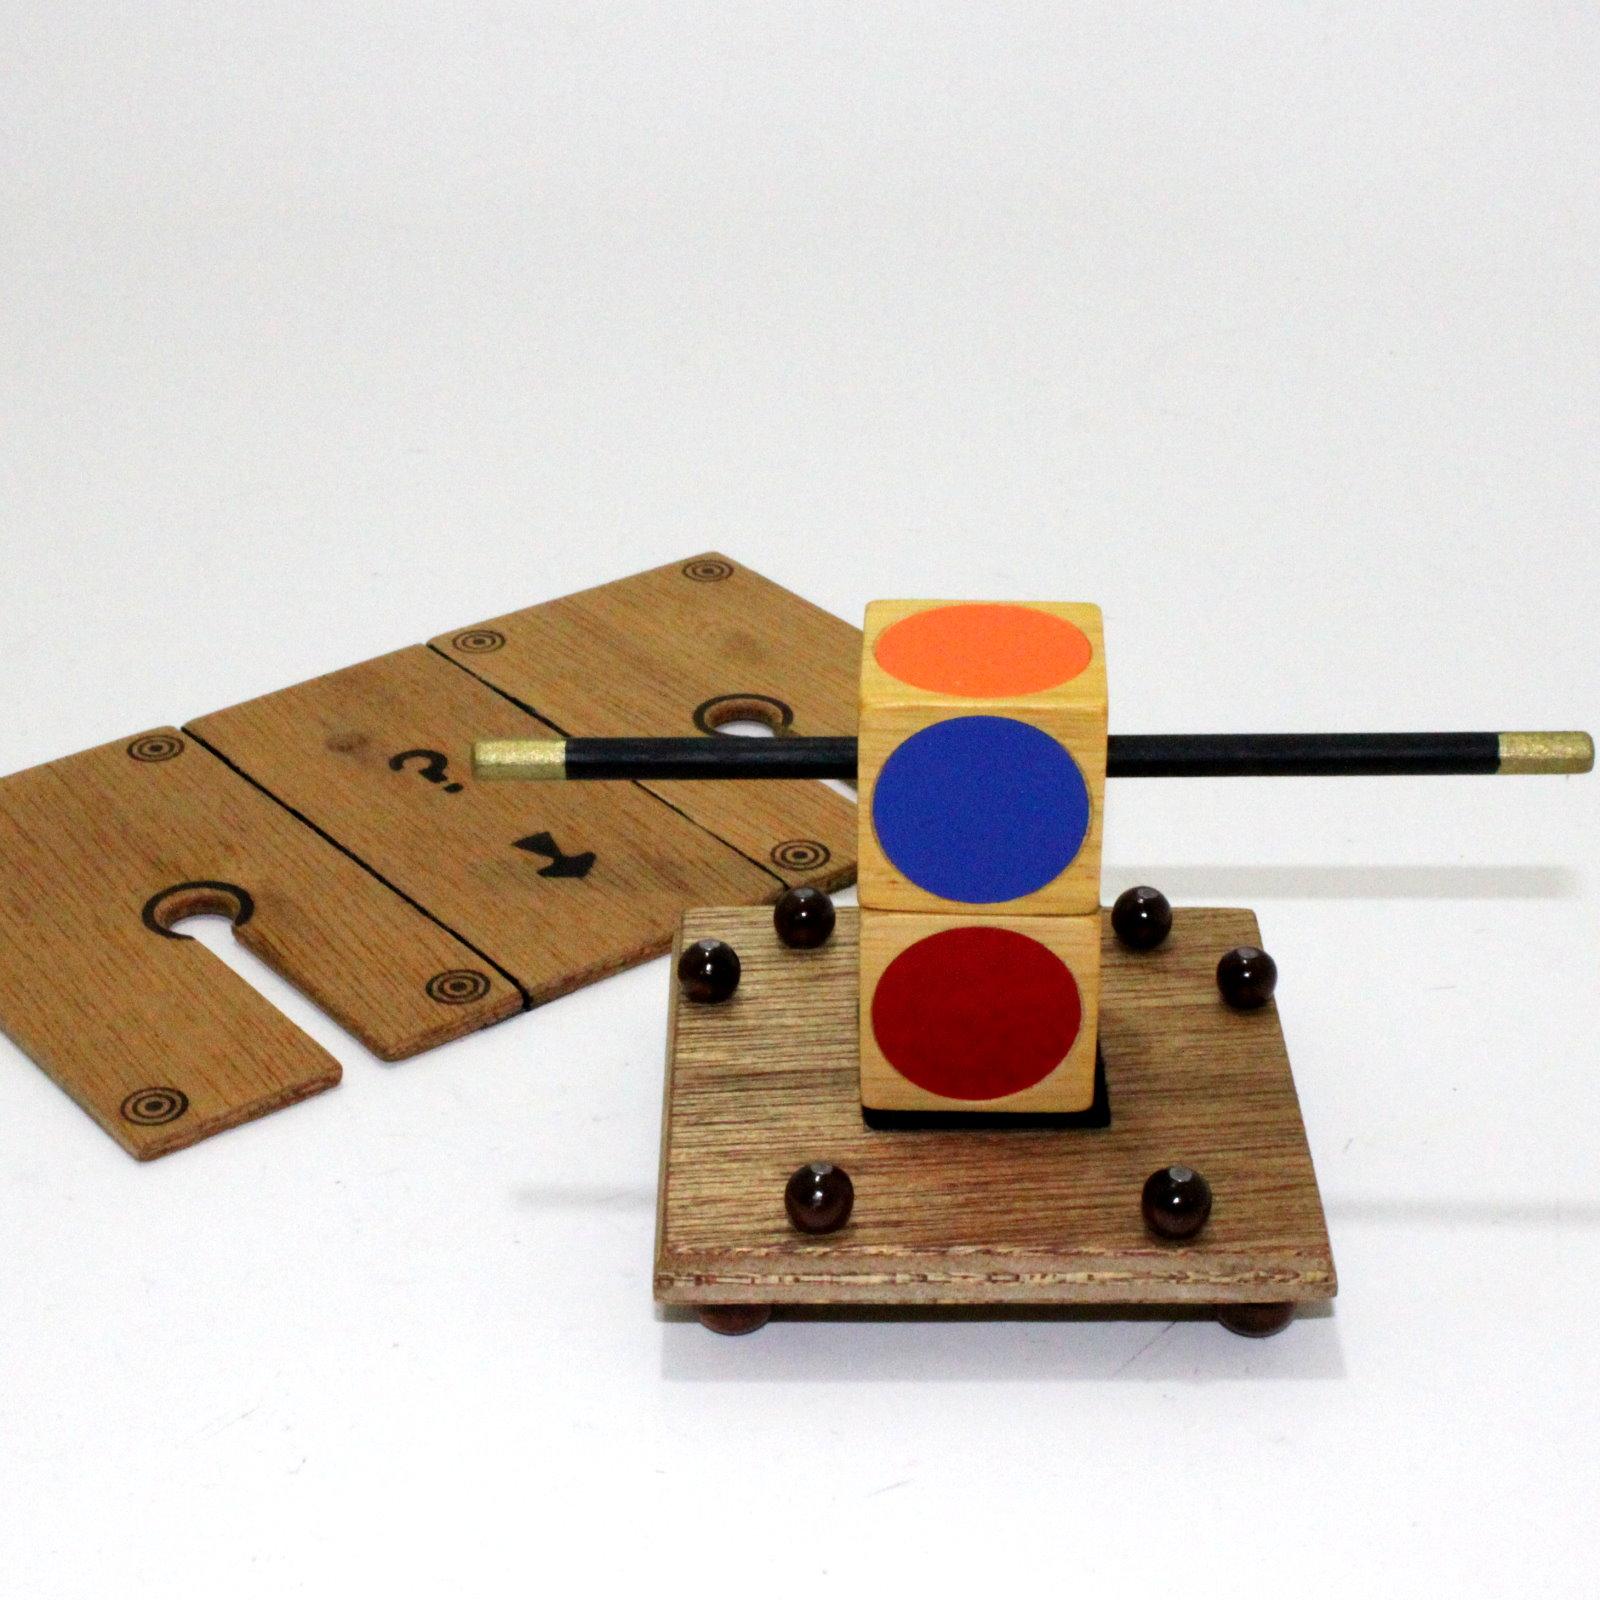 Cubes of Cagliostro by Howard Schwarzman, Magiro